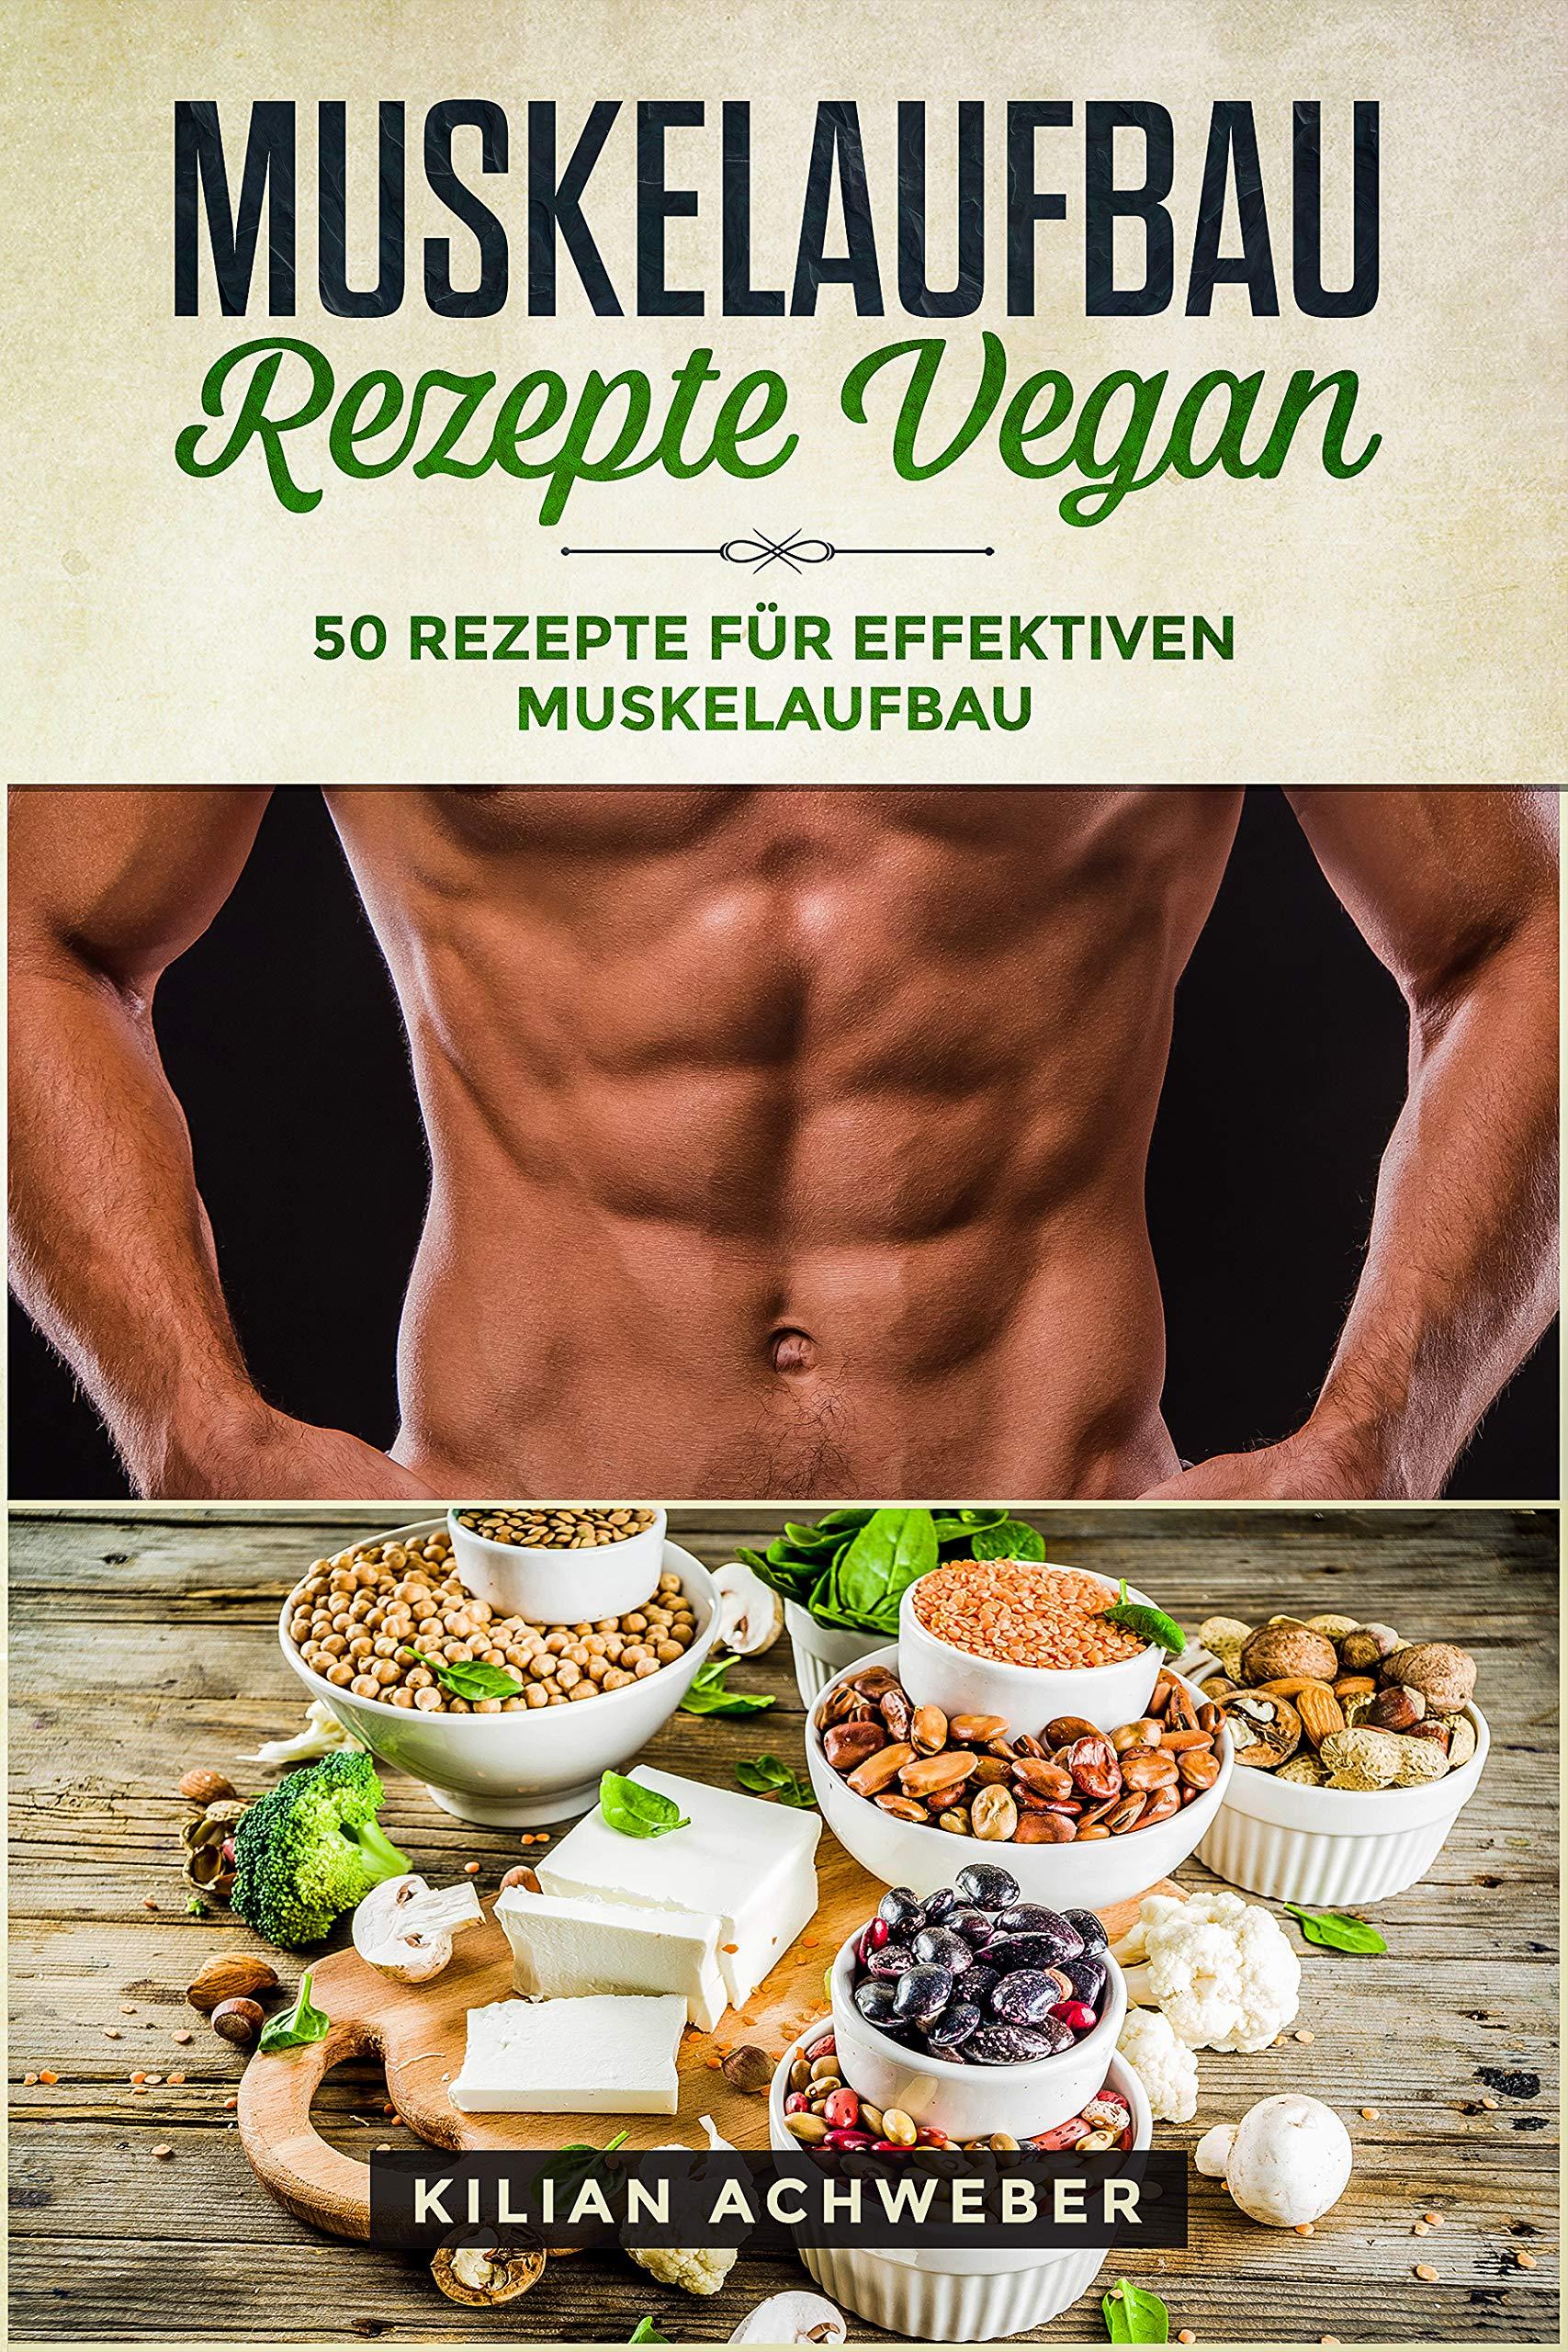 Muskelaufbau Rezepte Vegan  50 Rezepte Für Effektiven Muskelaufbau